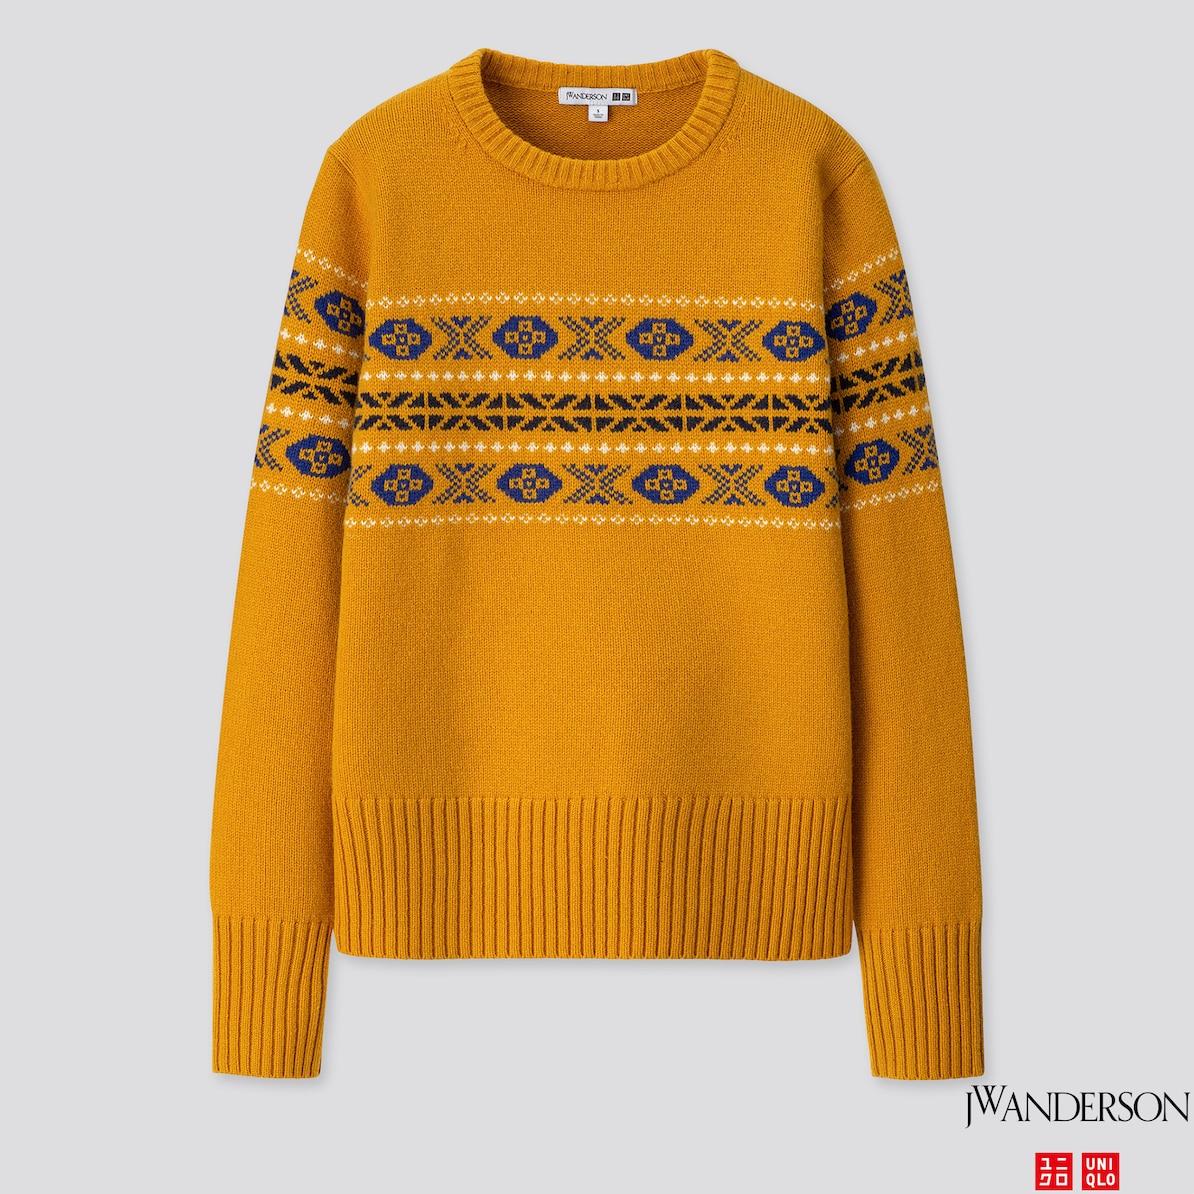 https://www.uniqlo.com/jp/store/goods/421621-58